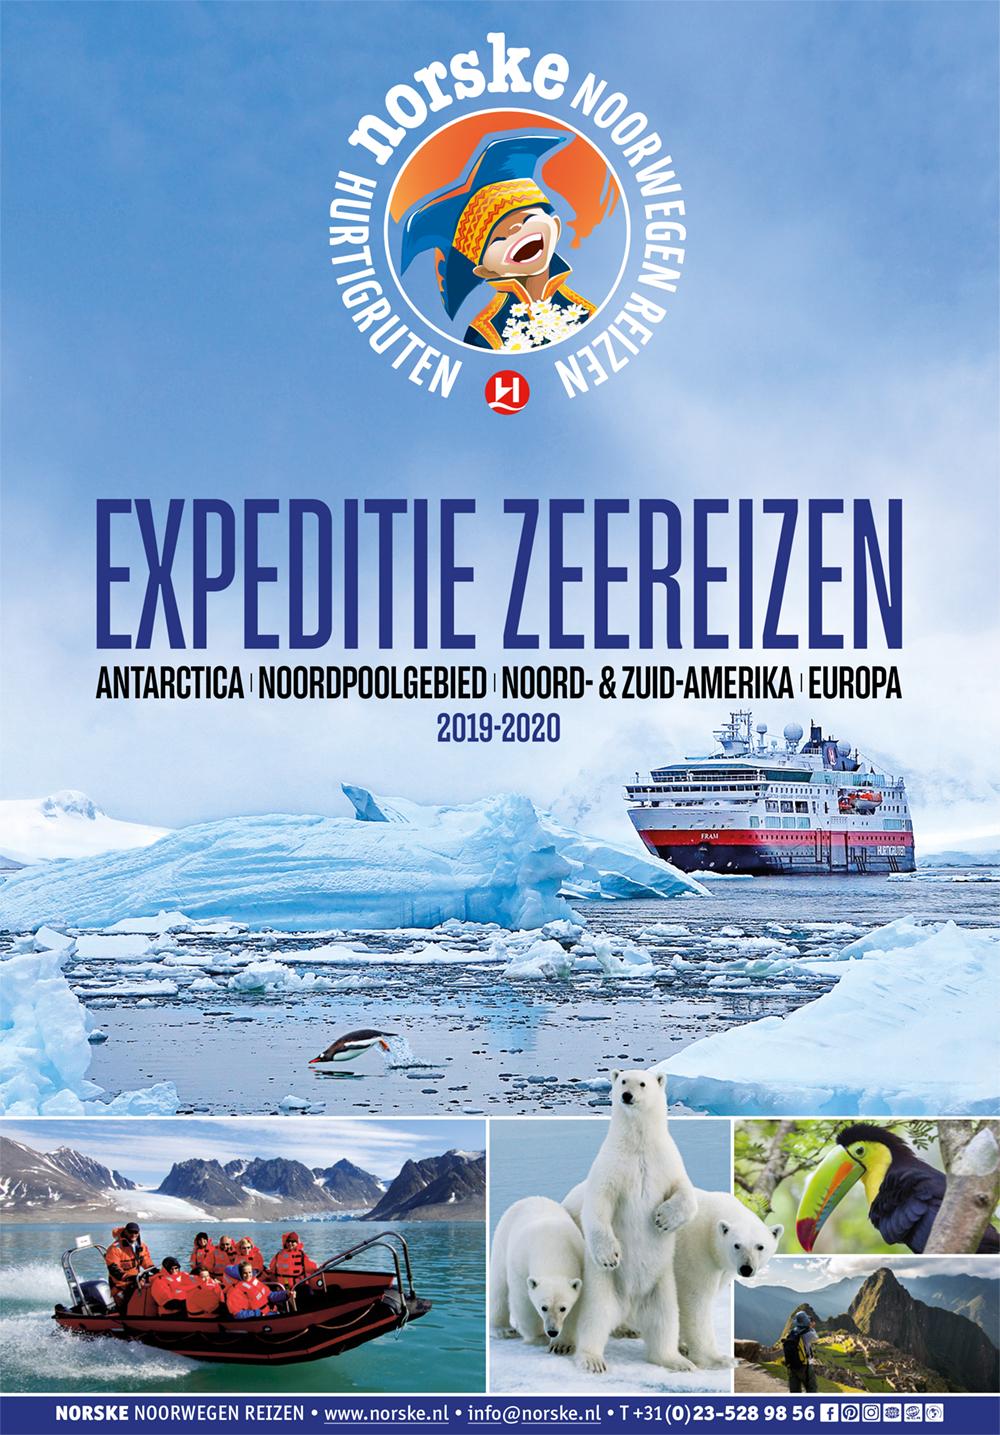 Hurtigruten Expeditie-Zeereizen 2019-2020